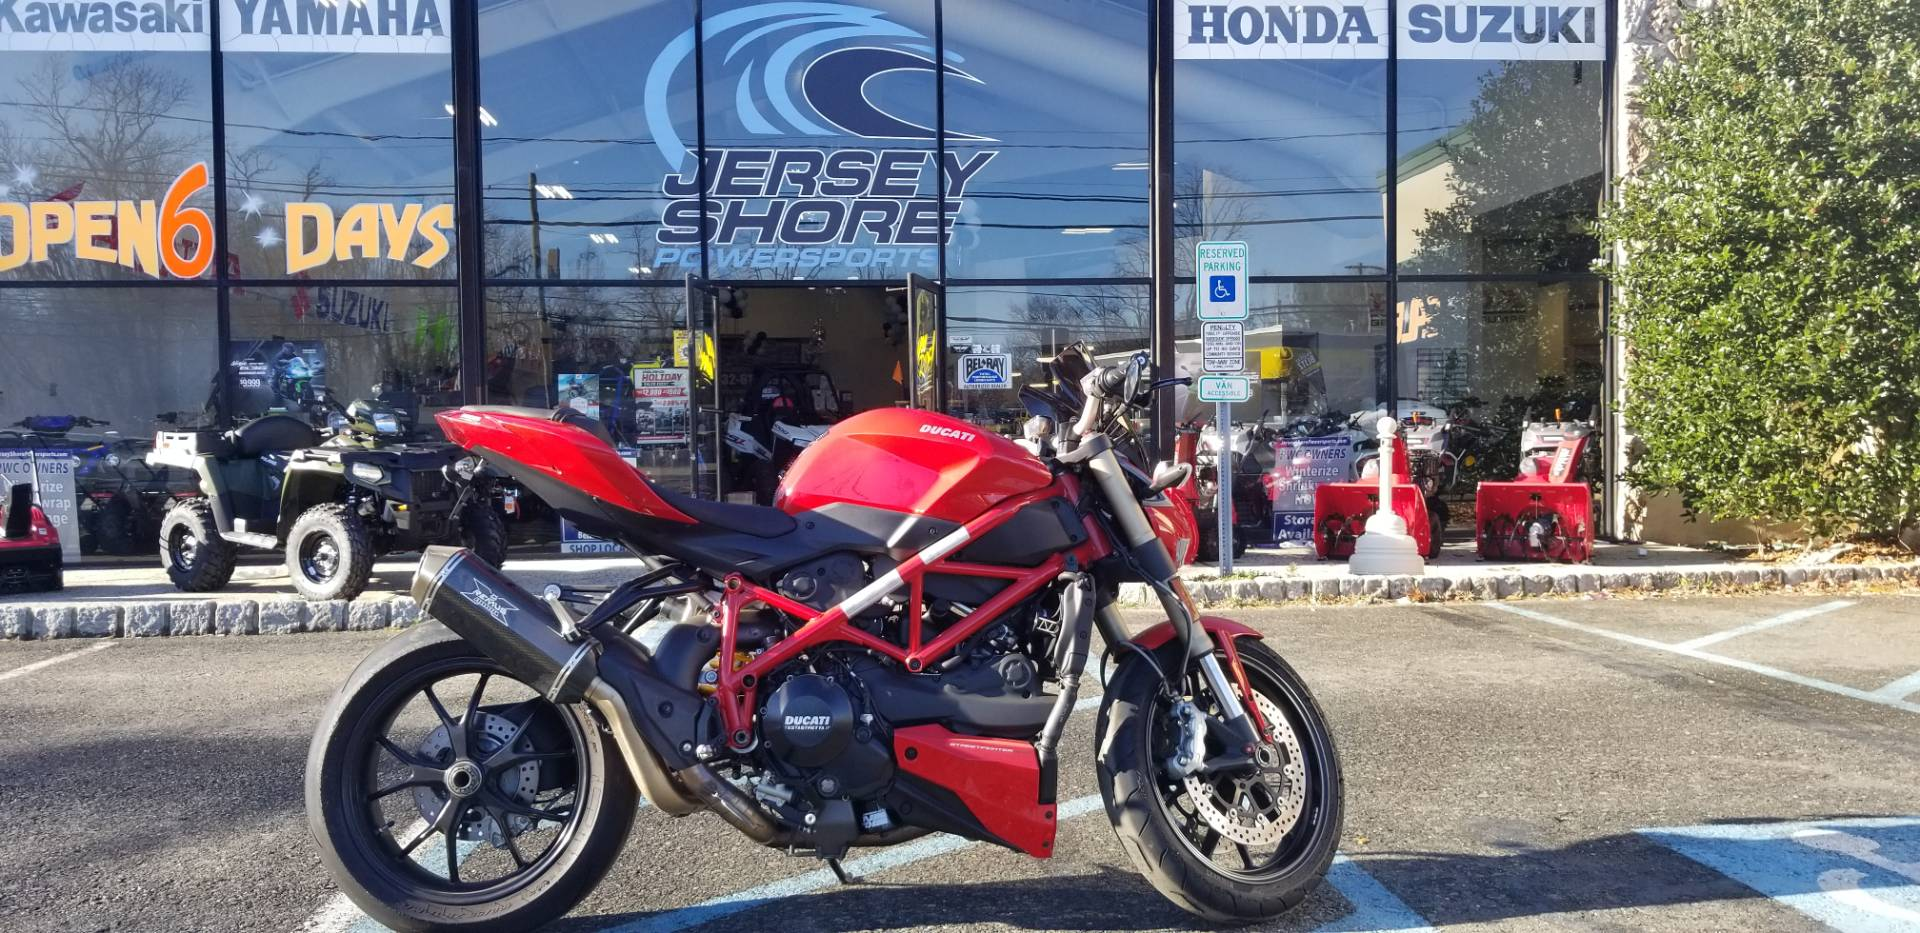 2015 Ducati Streetfighter 848 for sale 567